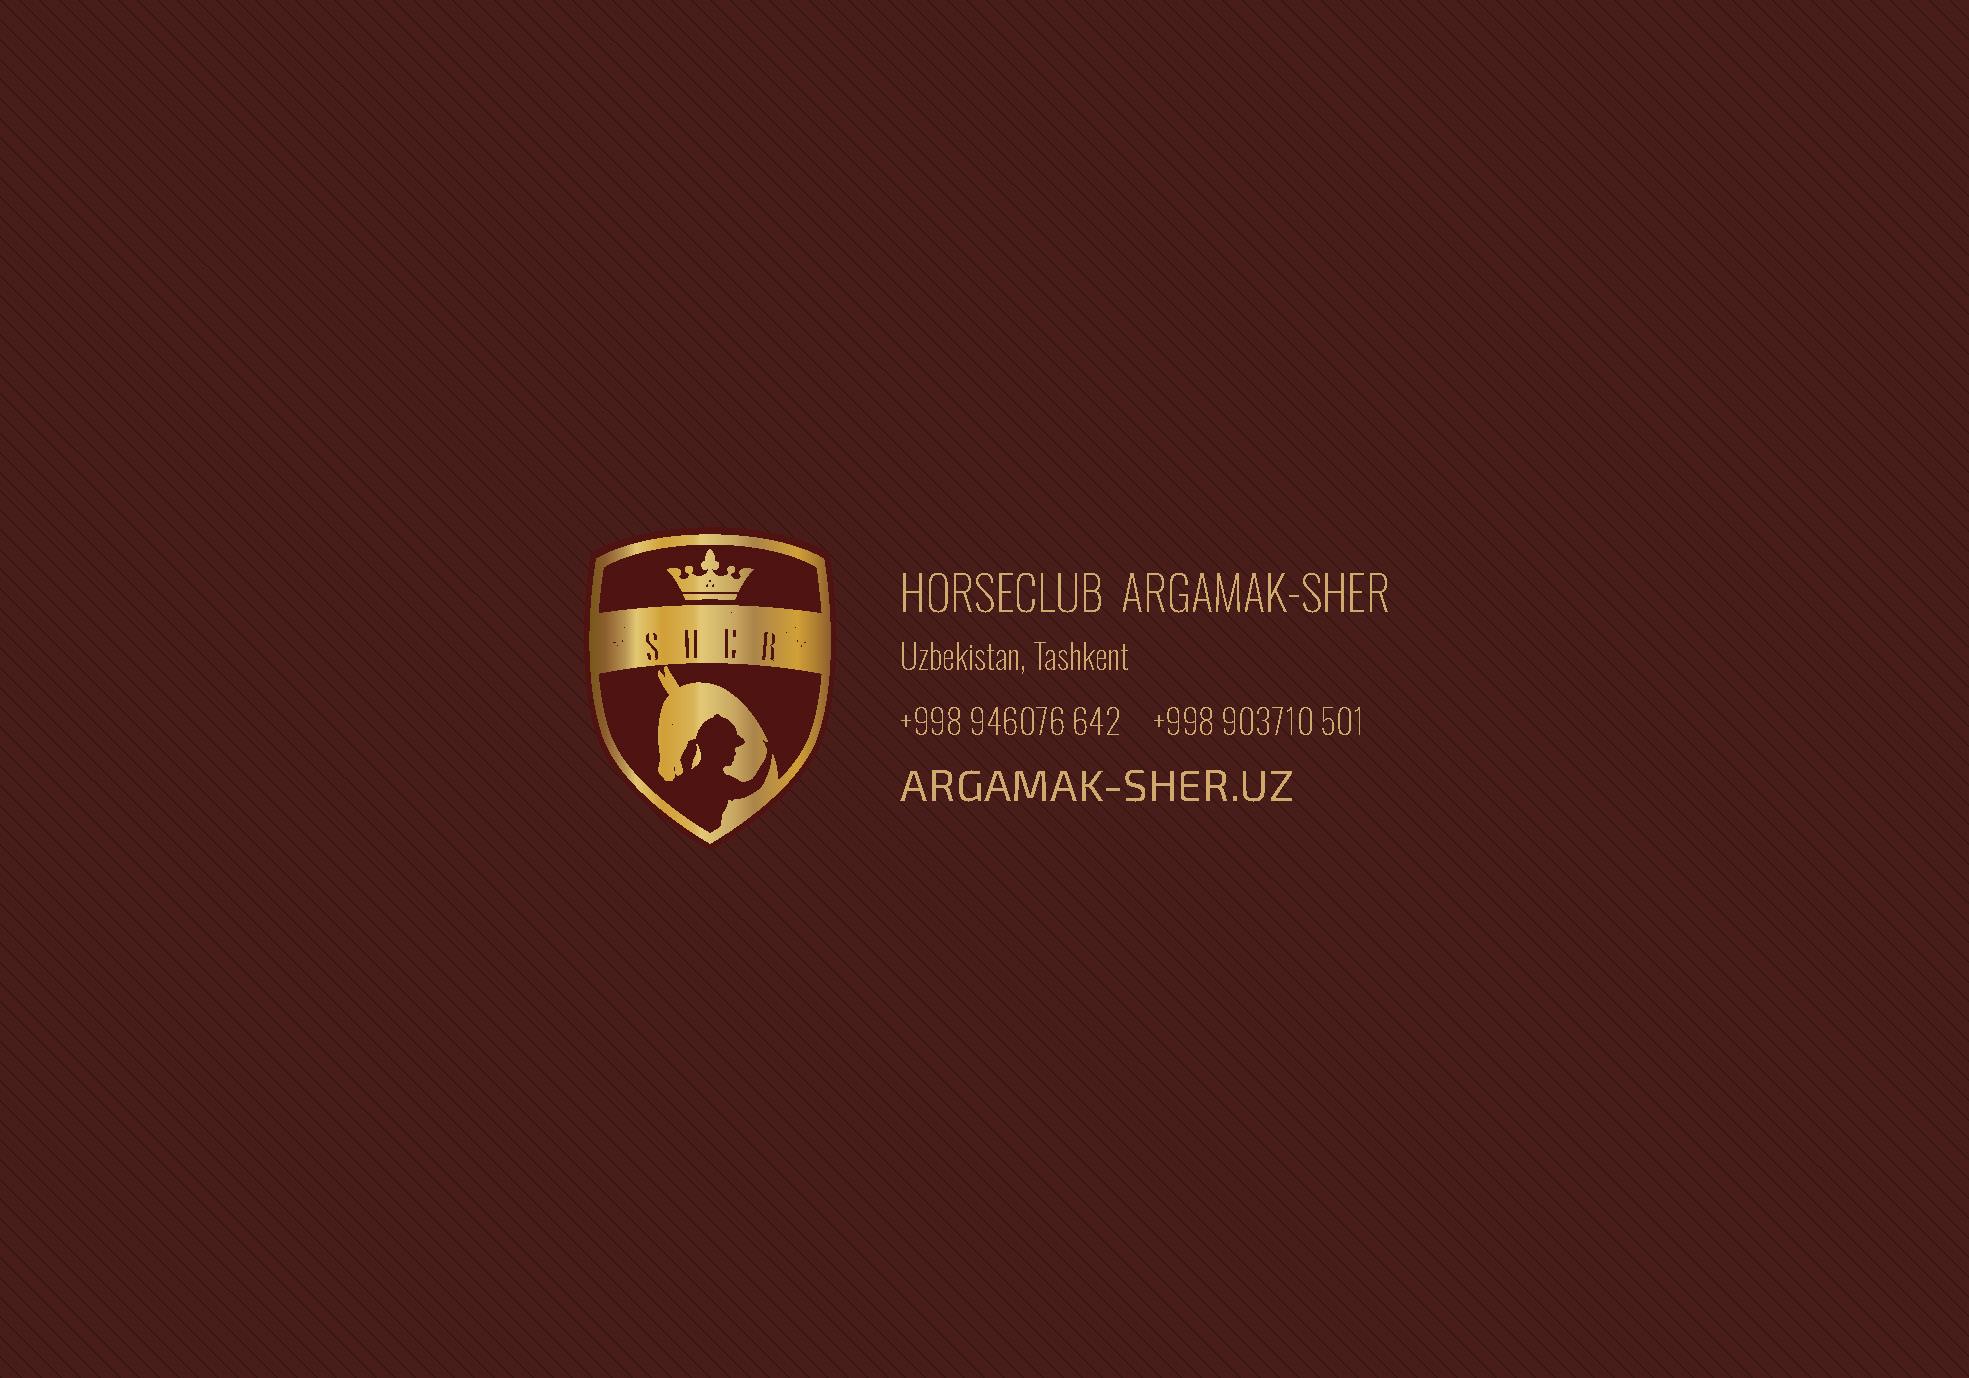 Argamak_sher каталог_Страница_36